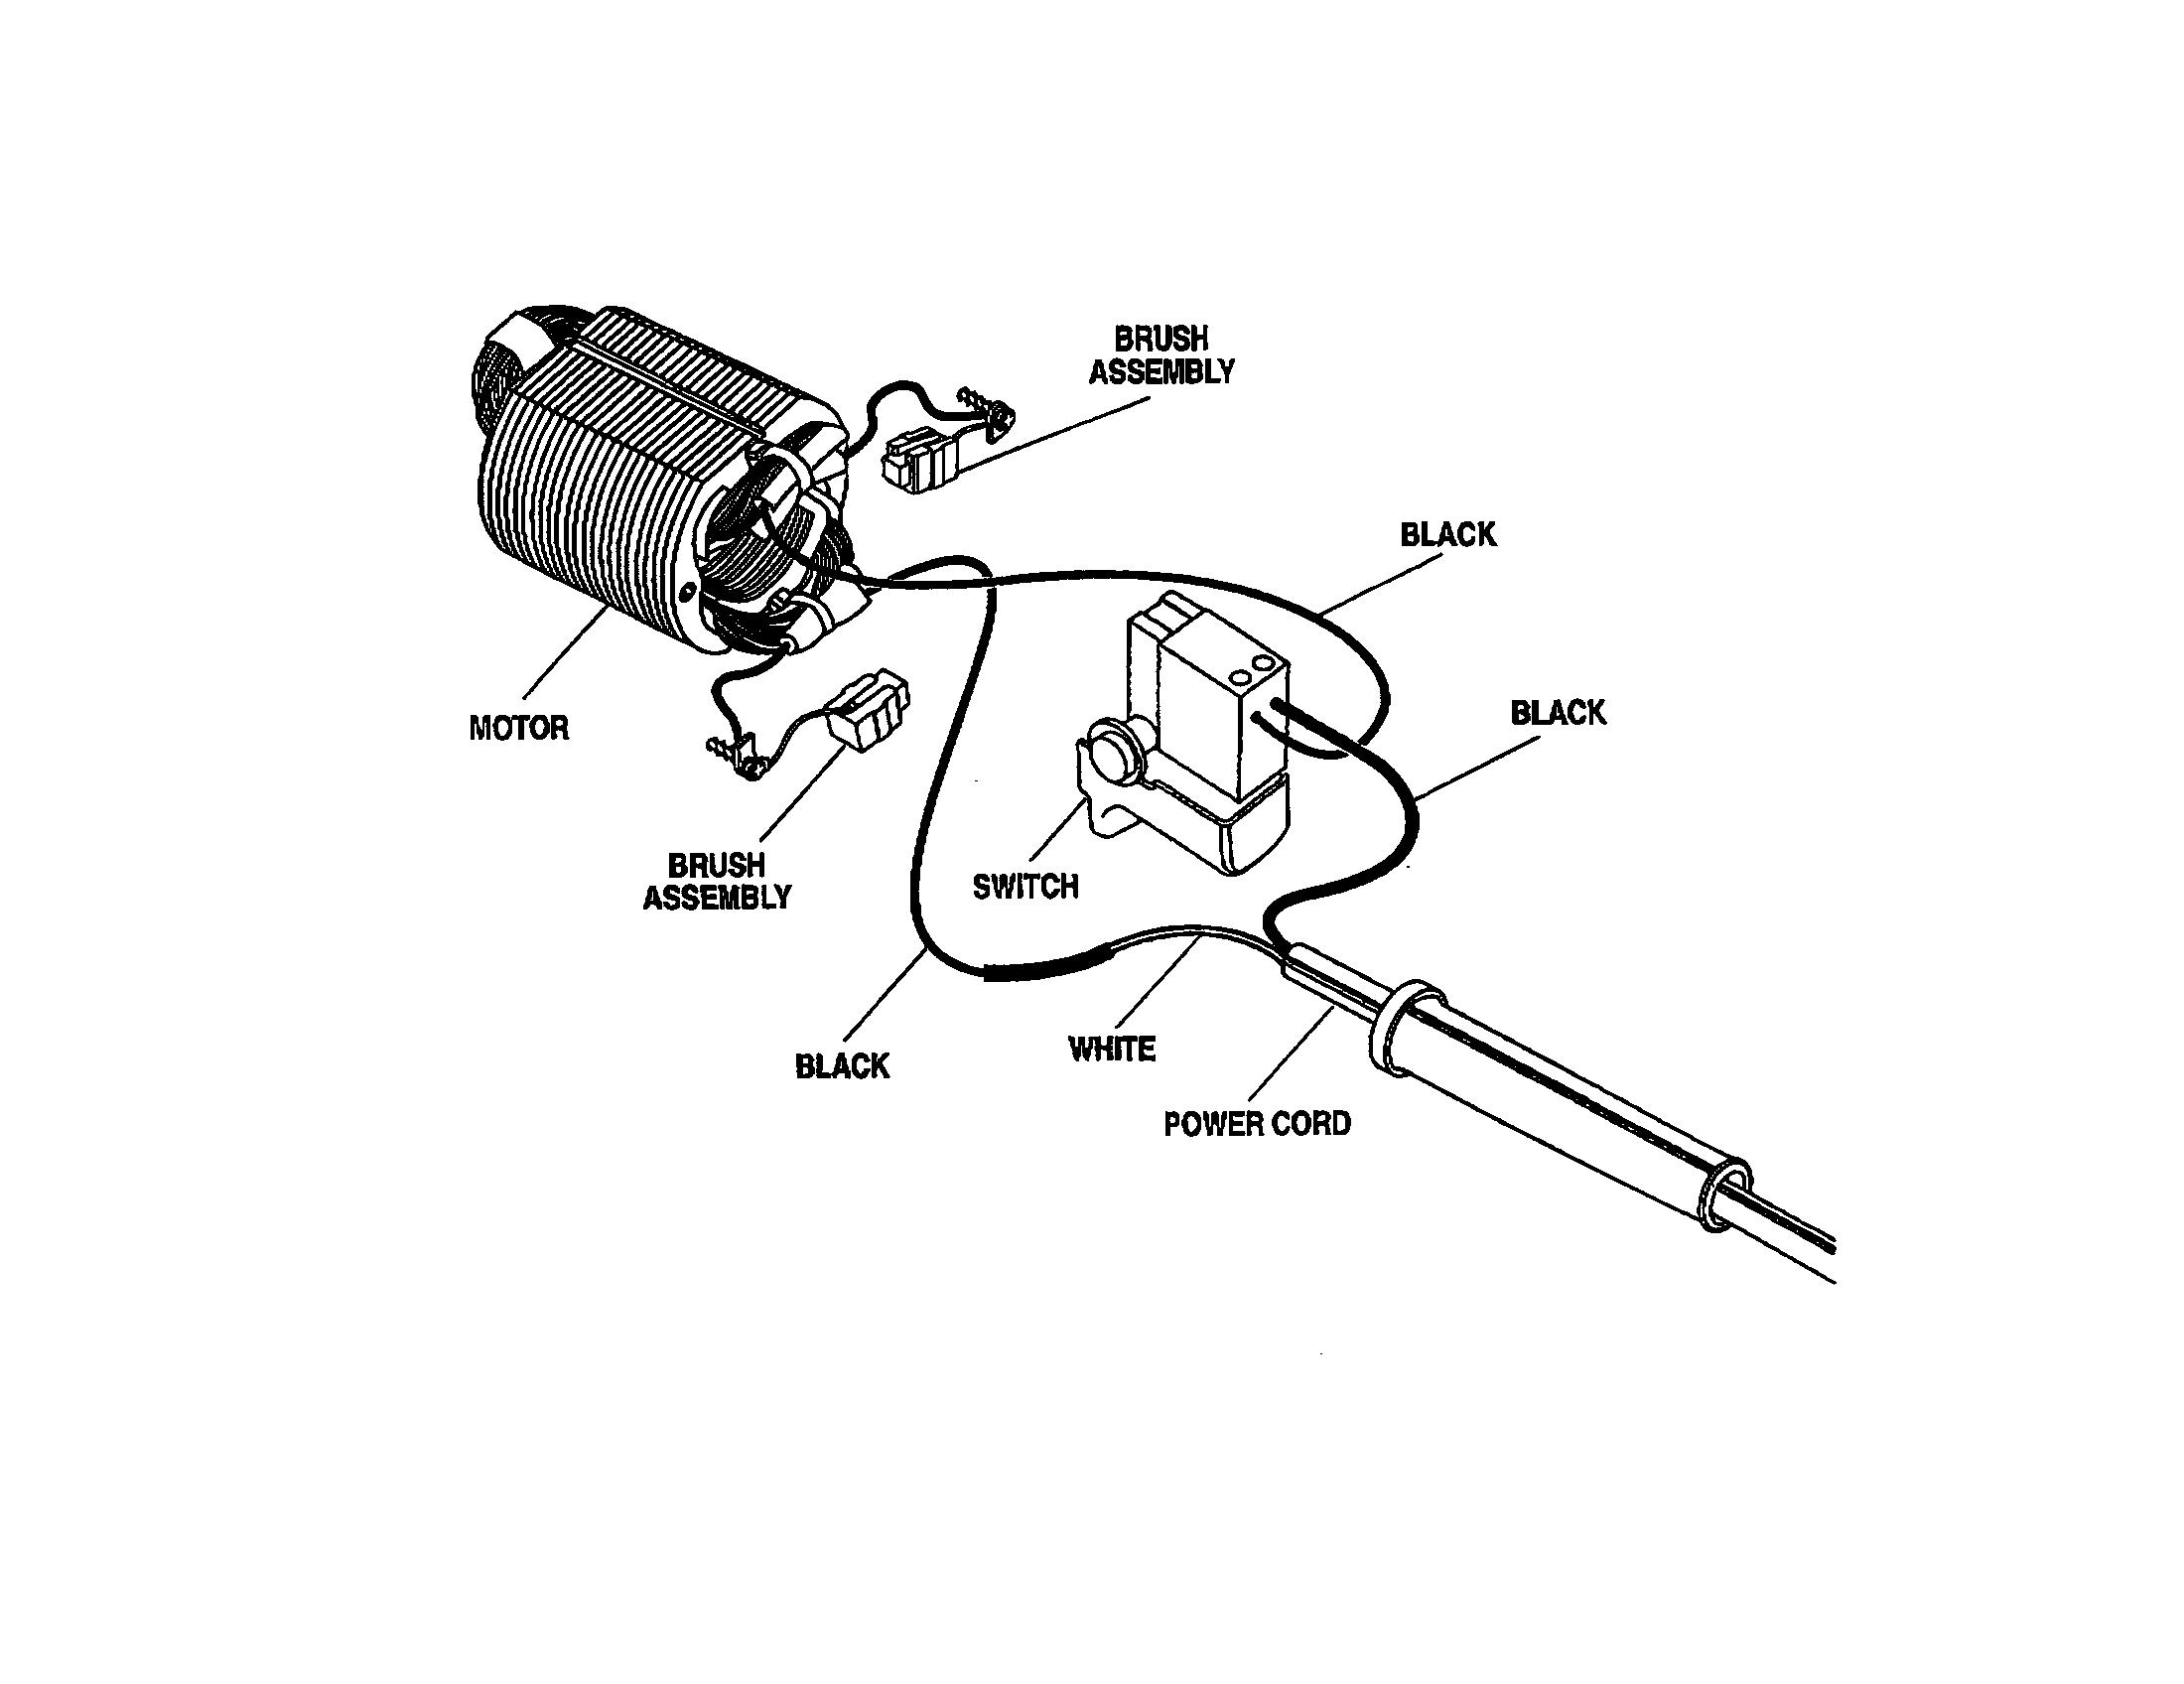 medium resolution of wiring diagram for grinder wiring diagram new mini grinder wiring diagram